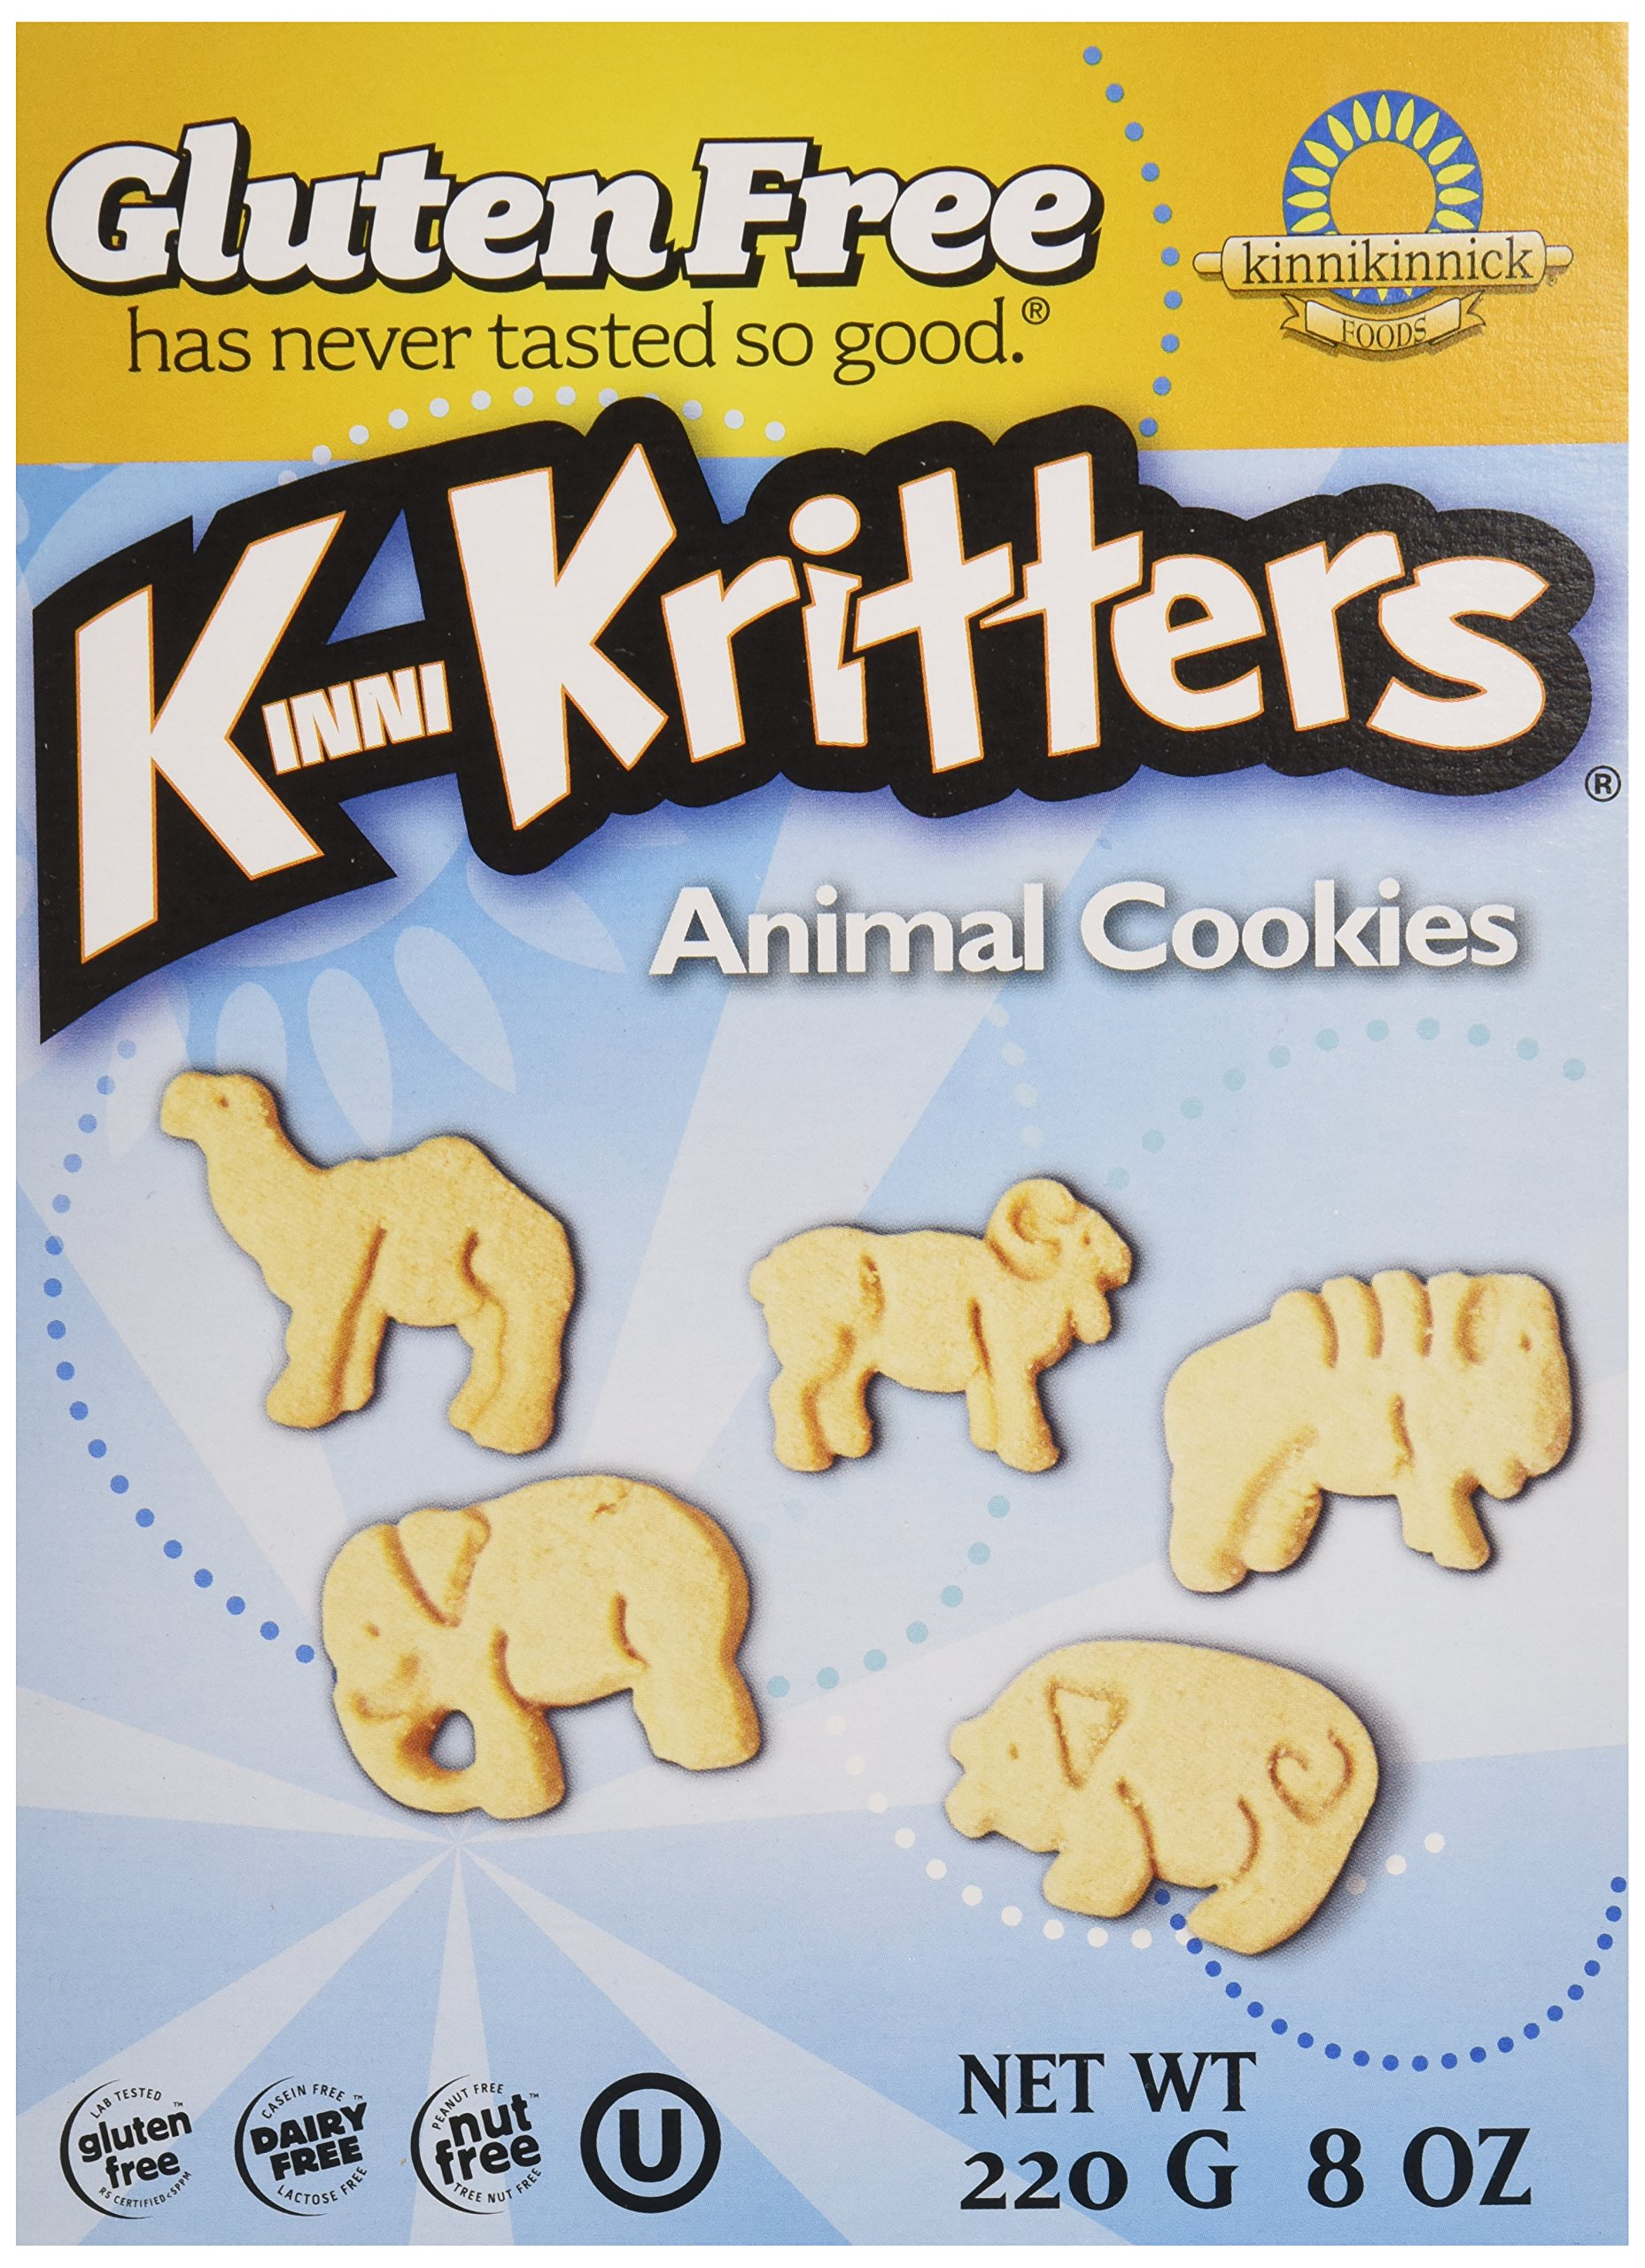 Kinnikinnick, Animal Cookies, Gluten Free, Wheat Free, Dairy Free, 8 oz by Kinnikinnick (Image #1)